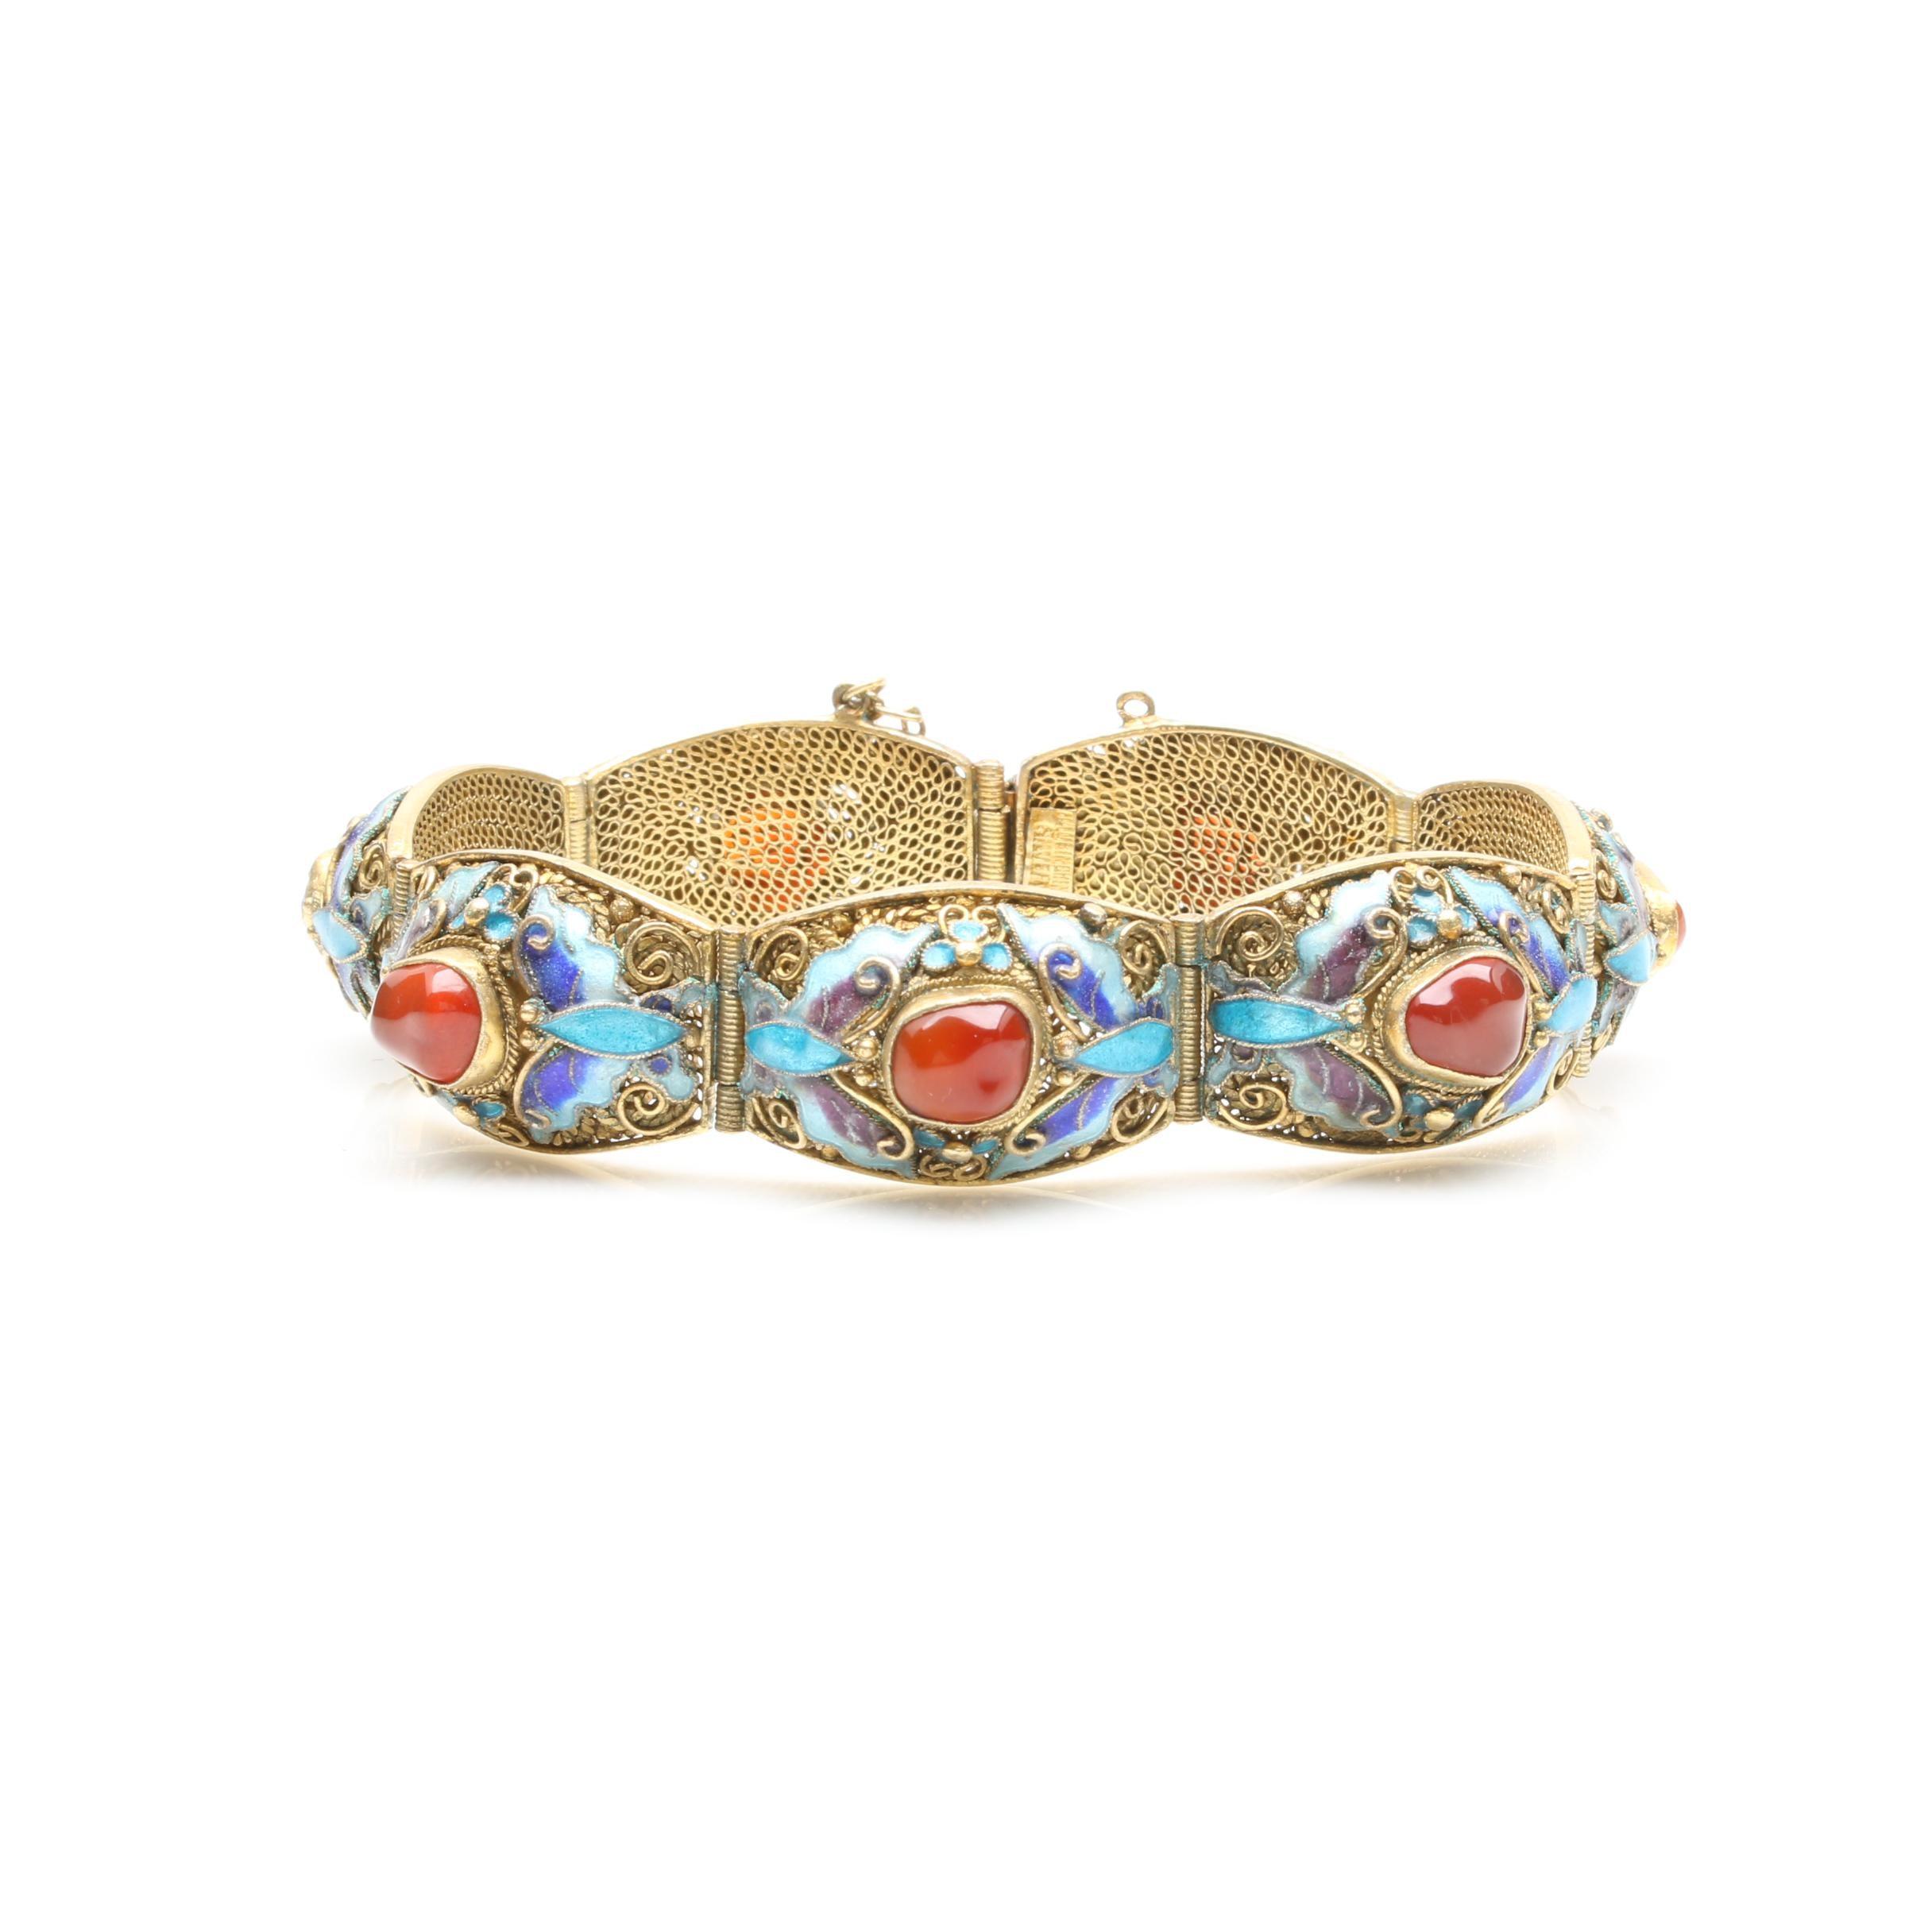 Vintage Chinese Gold Wash on Sterling Silver Carnelian and Enamel Bracelet